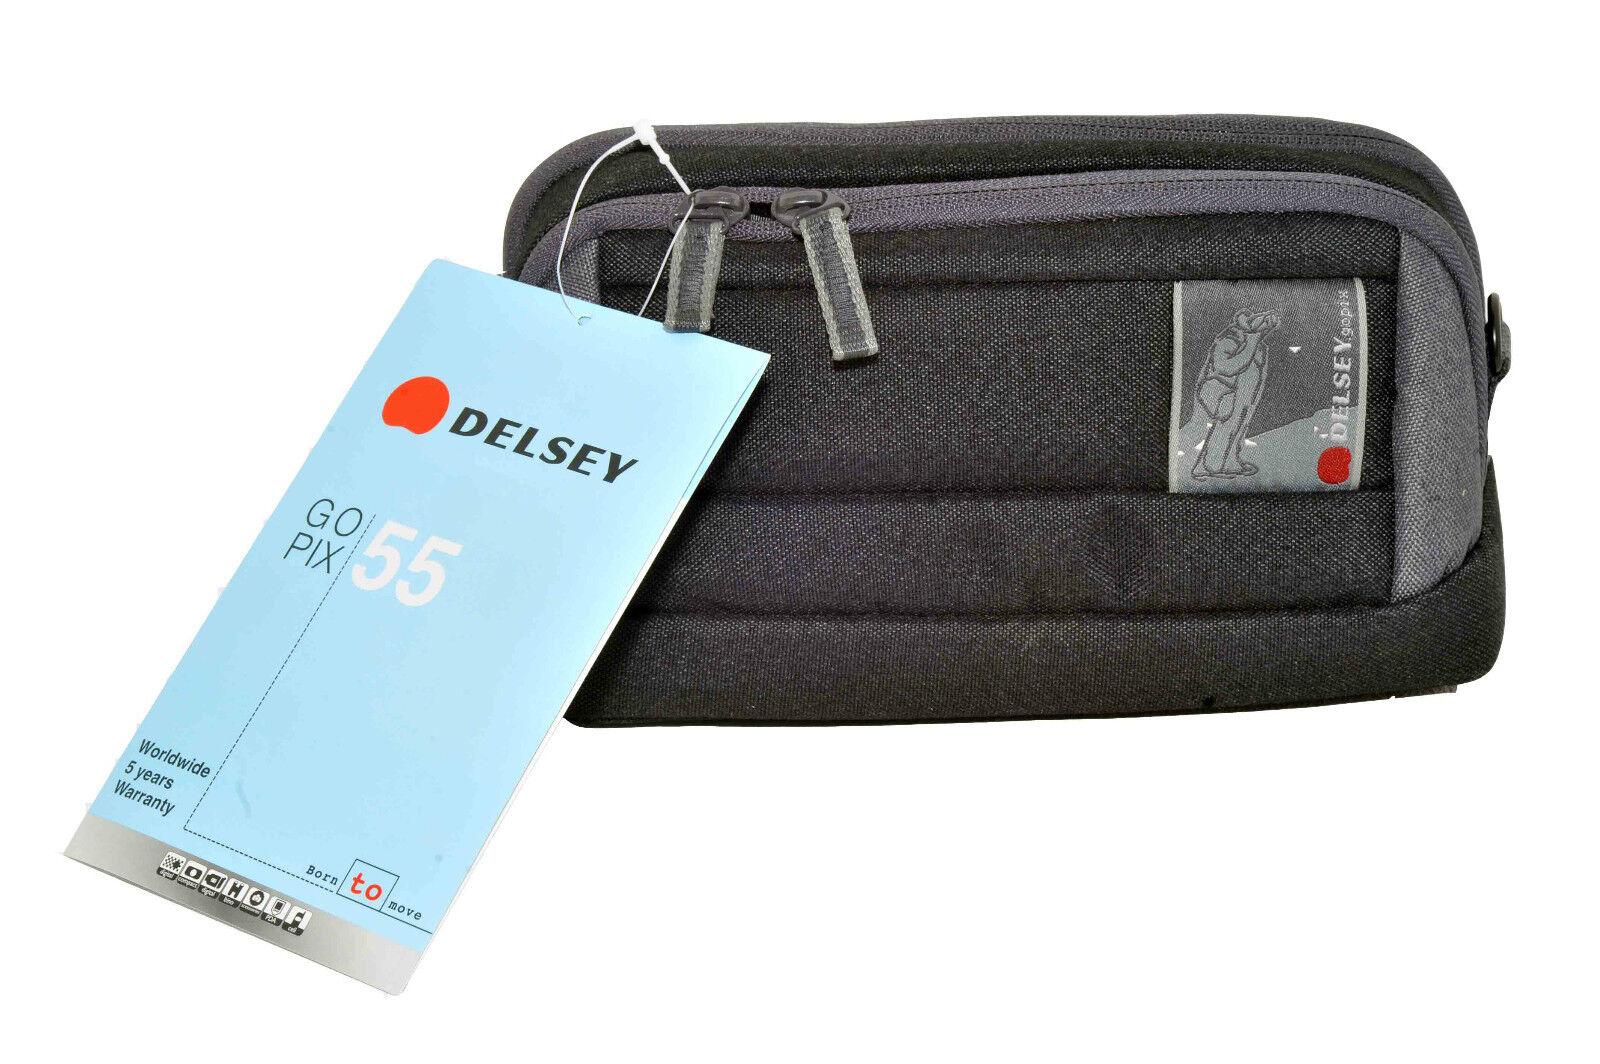 Delsey GOPIX 55 - Belt Pack for Camera - Fabric - Gray, Black Bum Bag